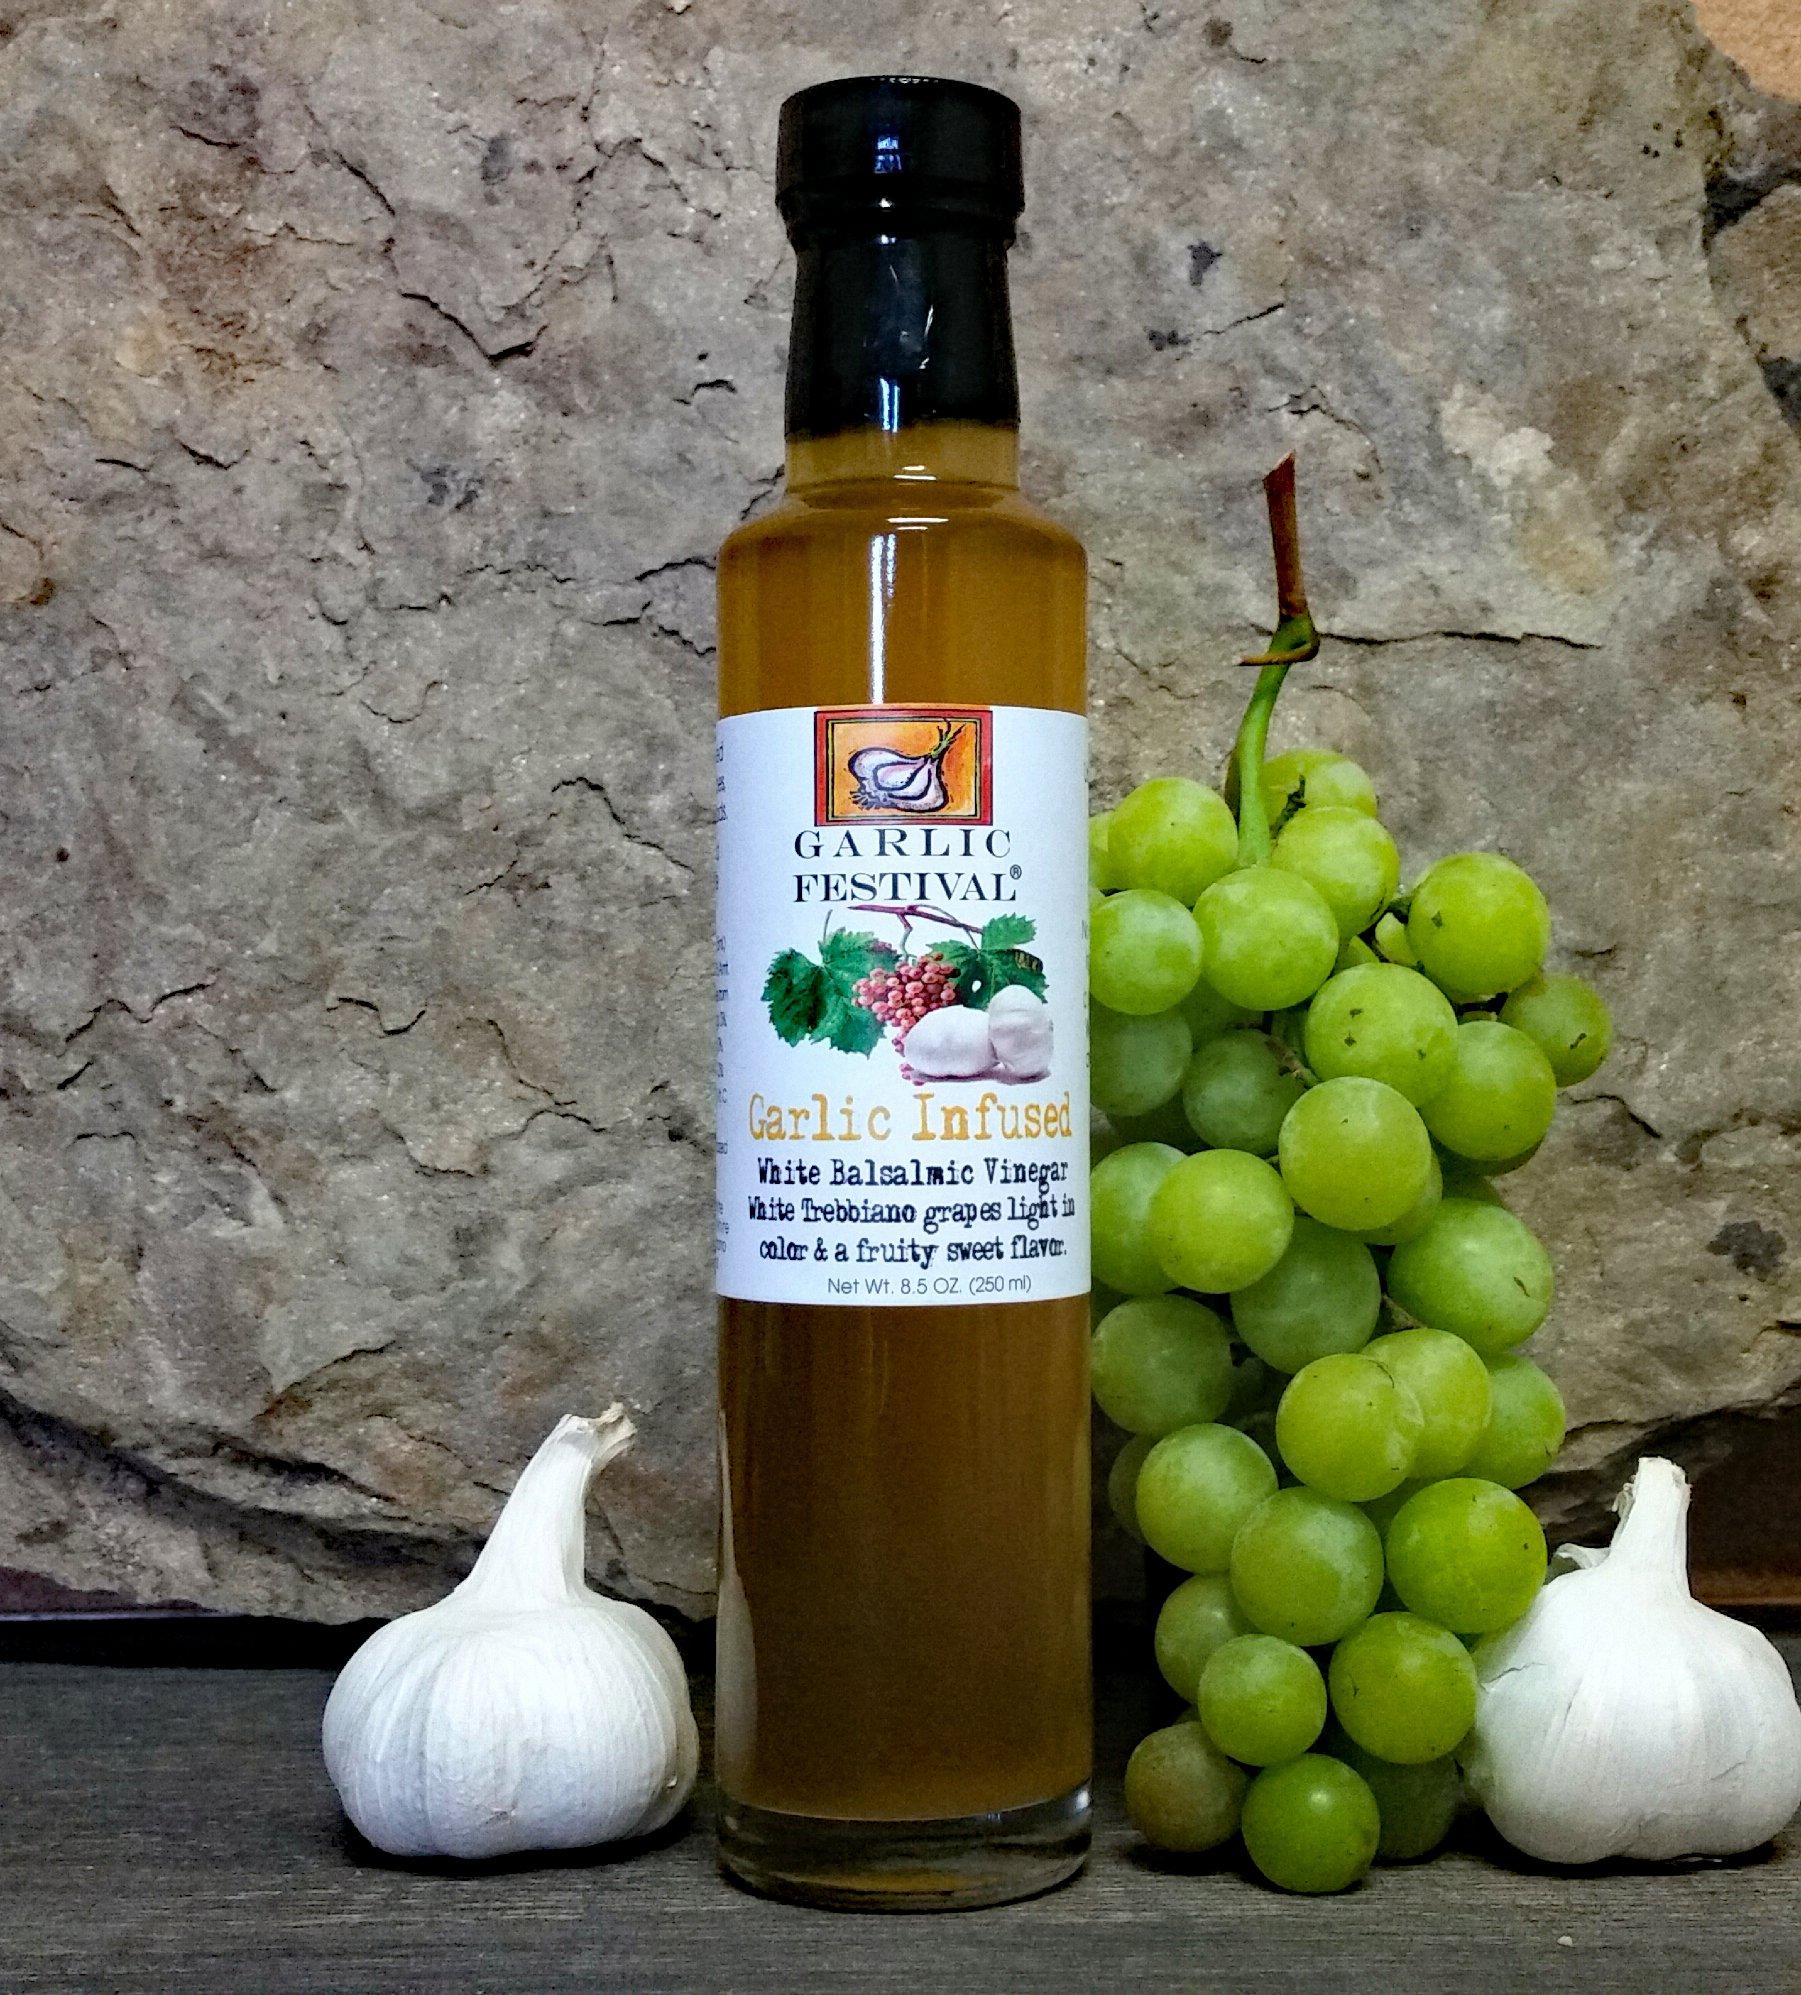 Garlic Festival Foods Garlic Infused White Balsamic Vinegar